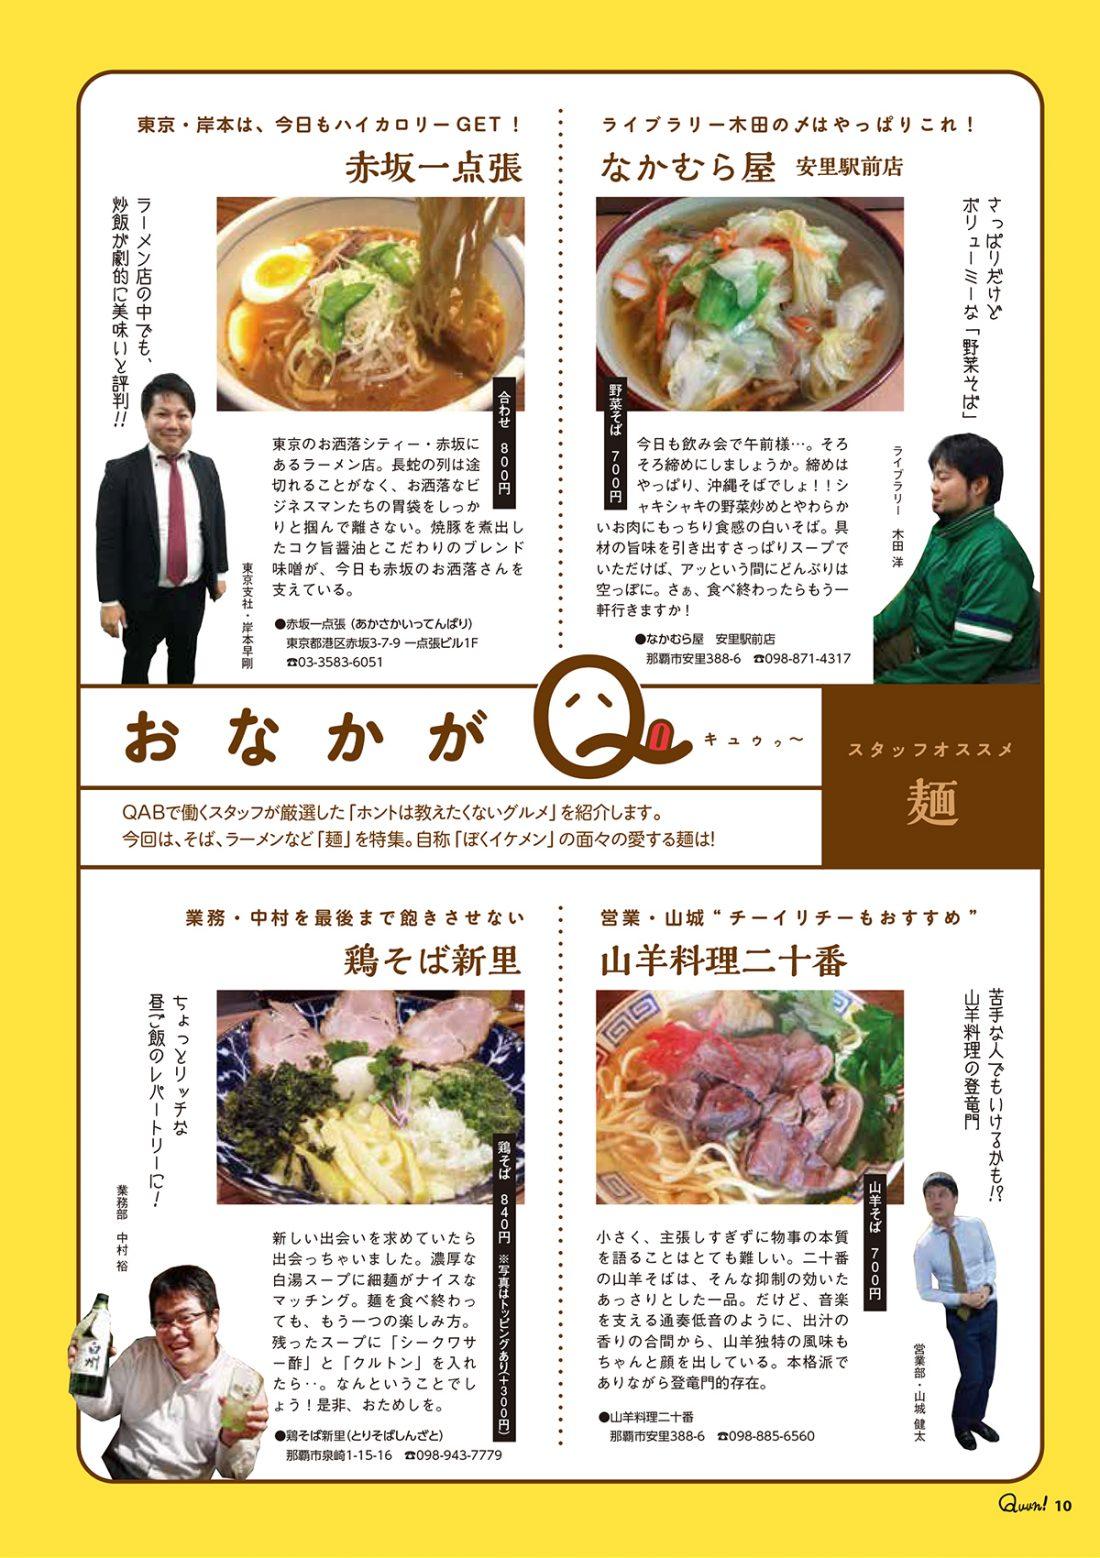 http://www.qab.co.jp/qgoro/wp-content/uploads/quun_0712-1100x1558.jpg